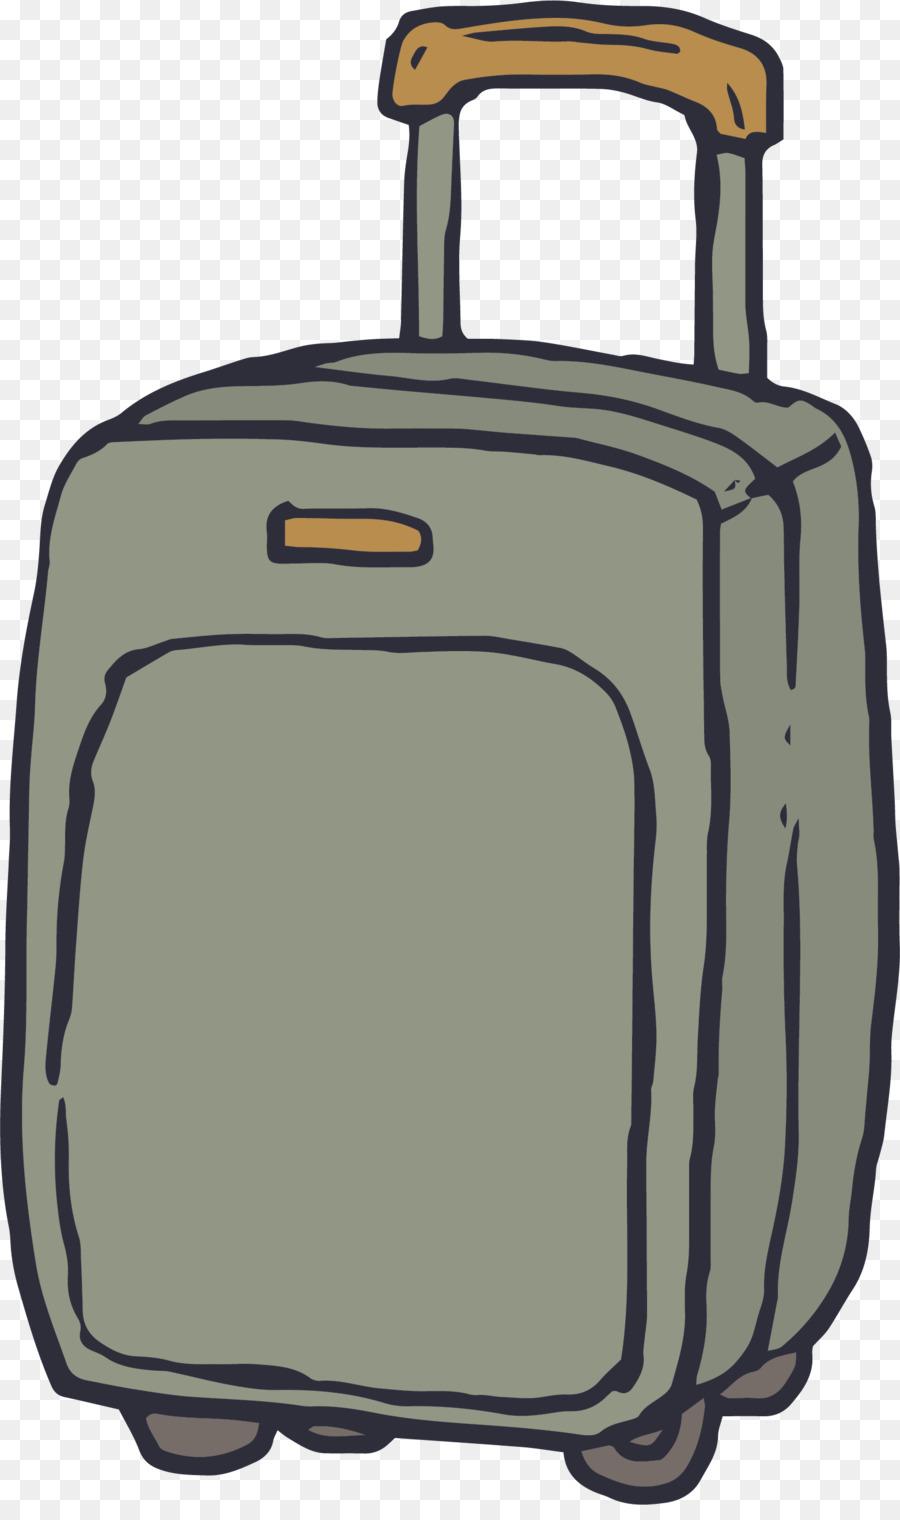 900x1520 Drawing Euclidean Vector Suitcase